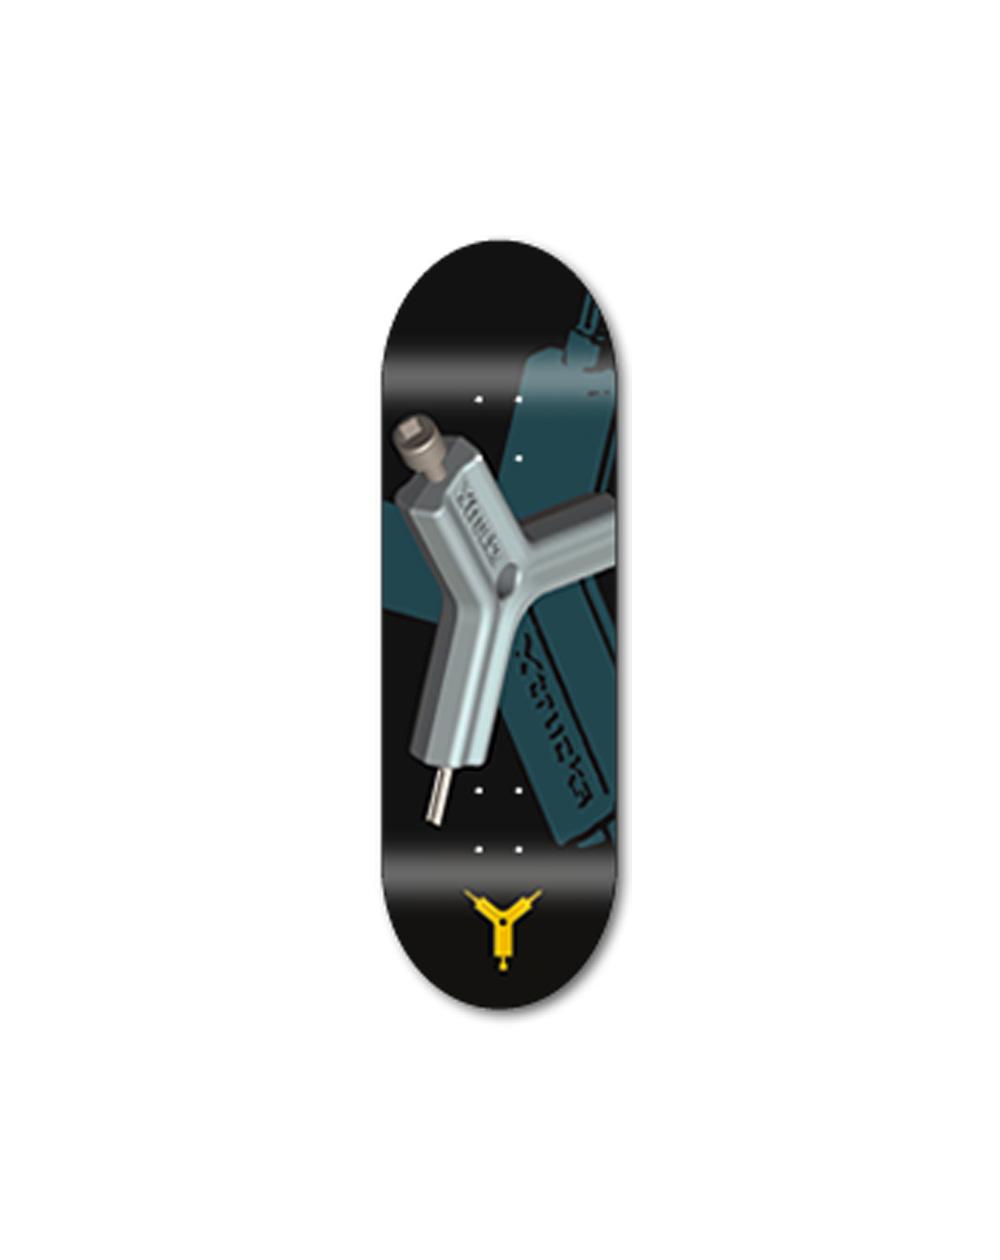 Yellowood Ytrucks III Z2 Fingerboard Deck